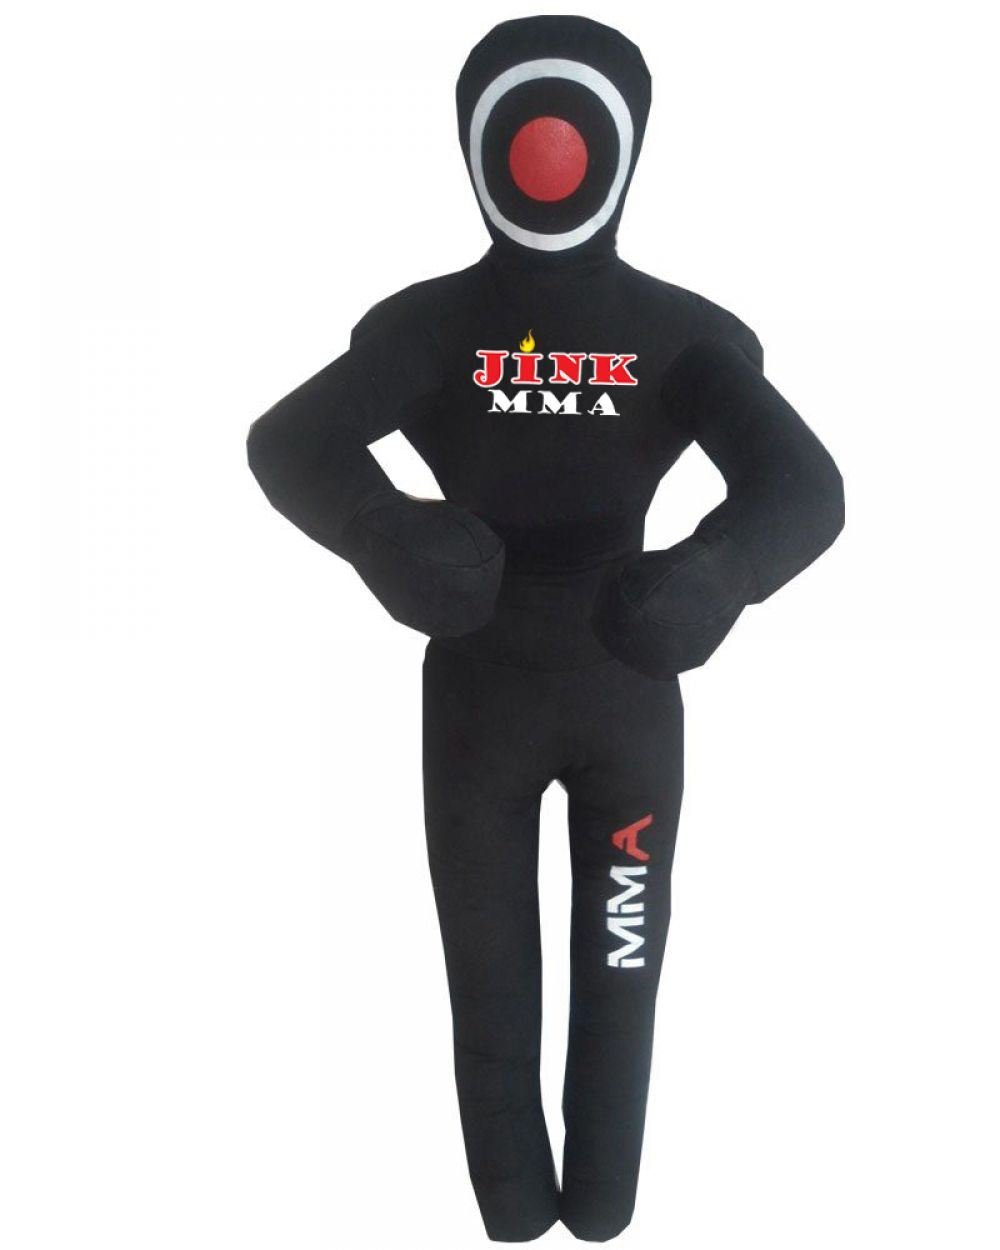 Jink Heavy Kickboxing Heavy Bag 70\ Black MMA Grappling柔道ダミー – Standing & Fighting位置 70\ Canvas - Black B0193ILDW8, モリヨシマチ:b6c6dc32 --- capela.dominiotemporario.com